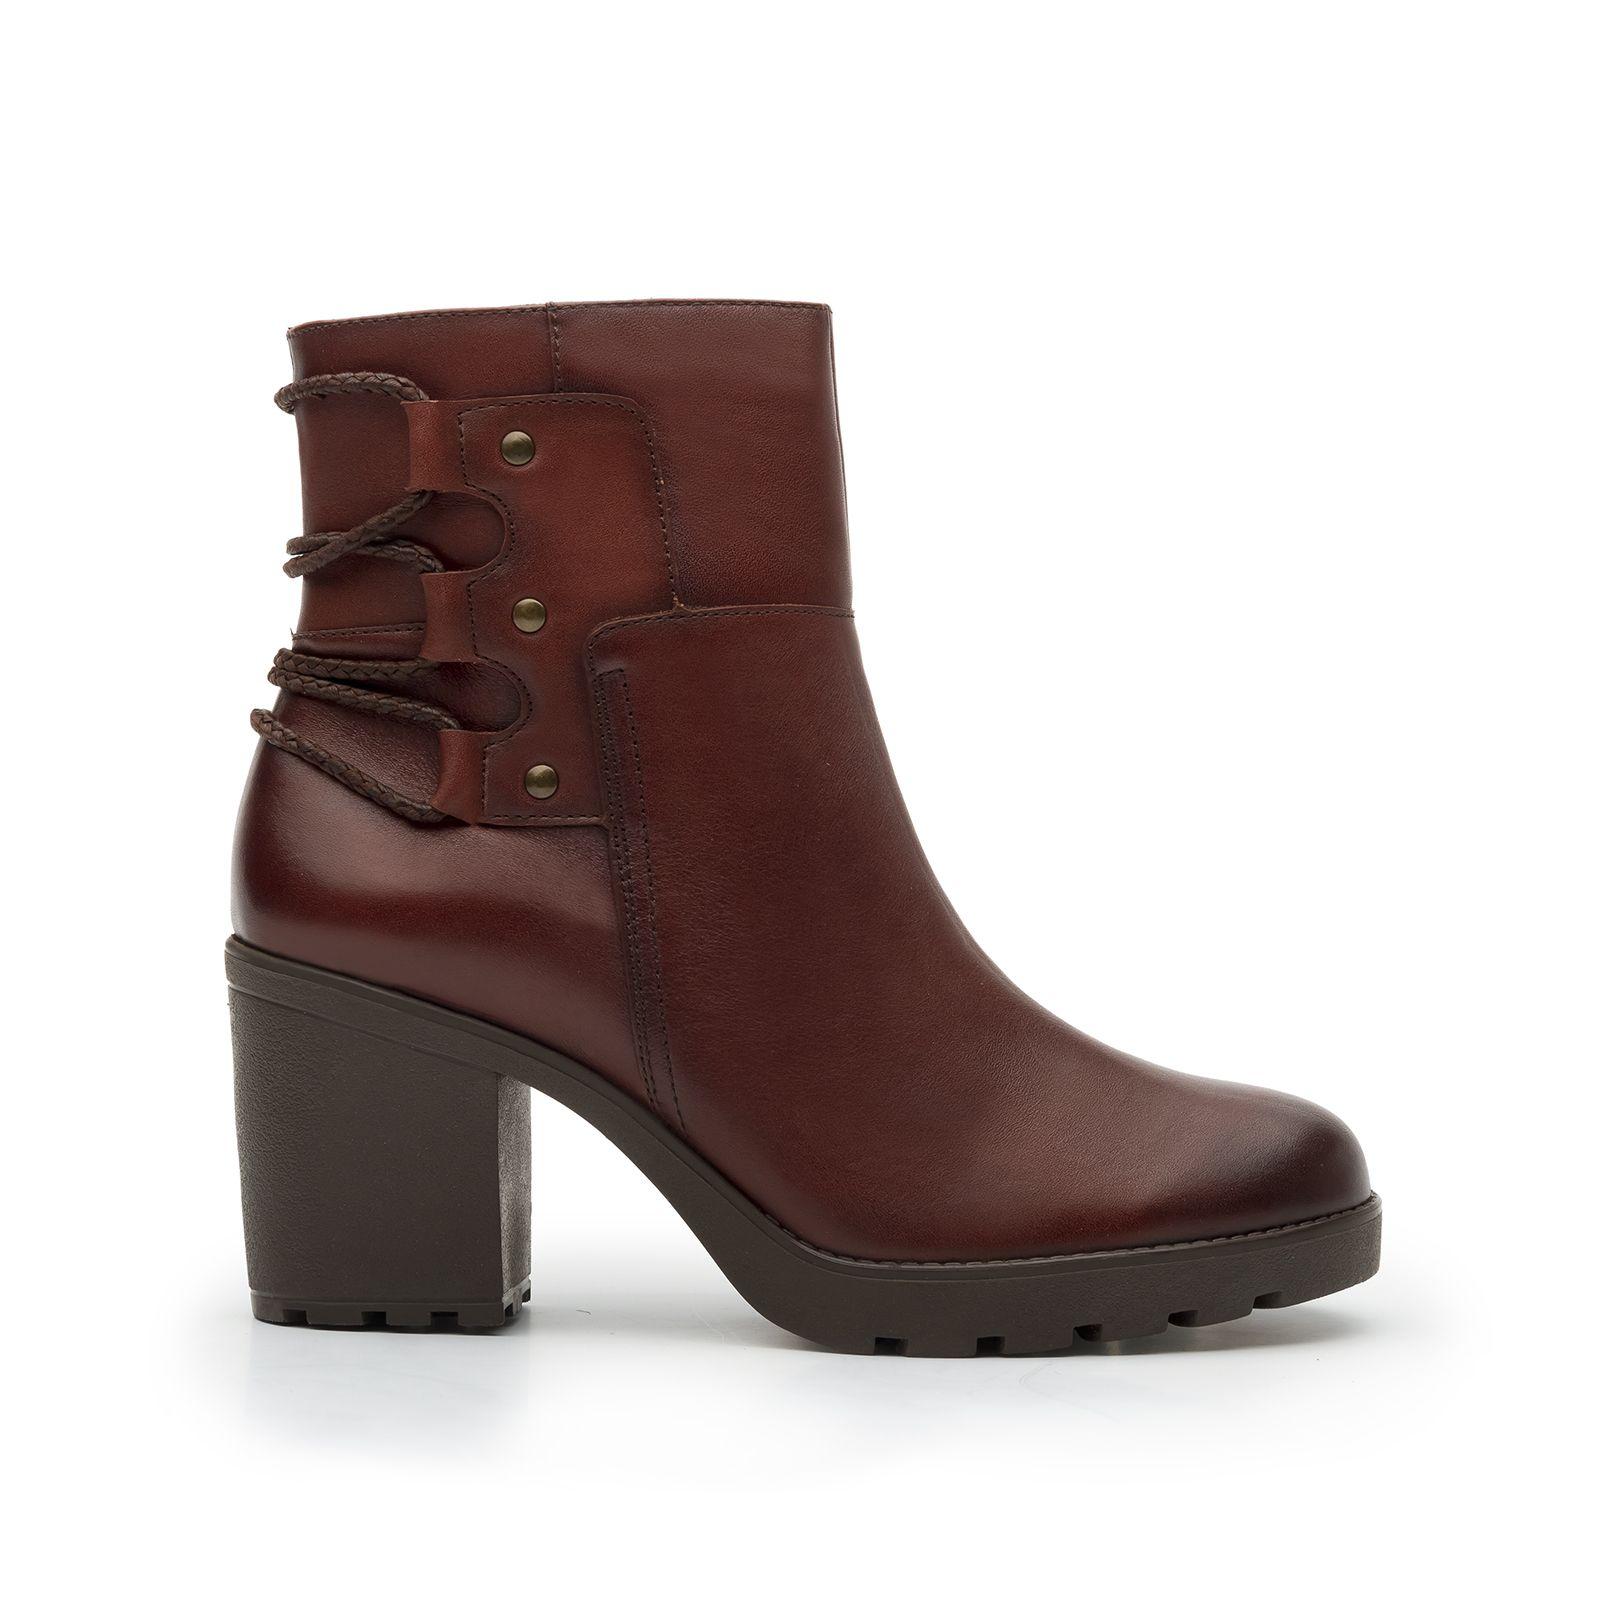 4df0c8478ac48 Botas para Dama Flexi al mejor precio - Zapatos Flexi México